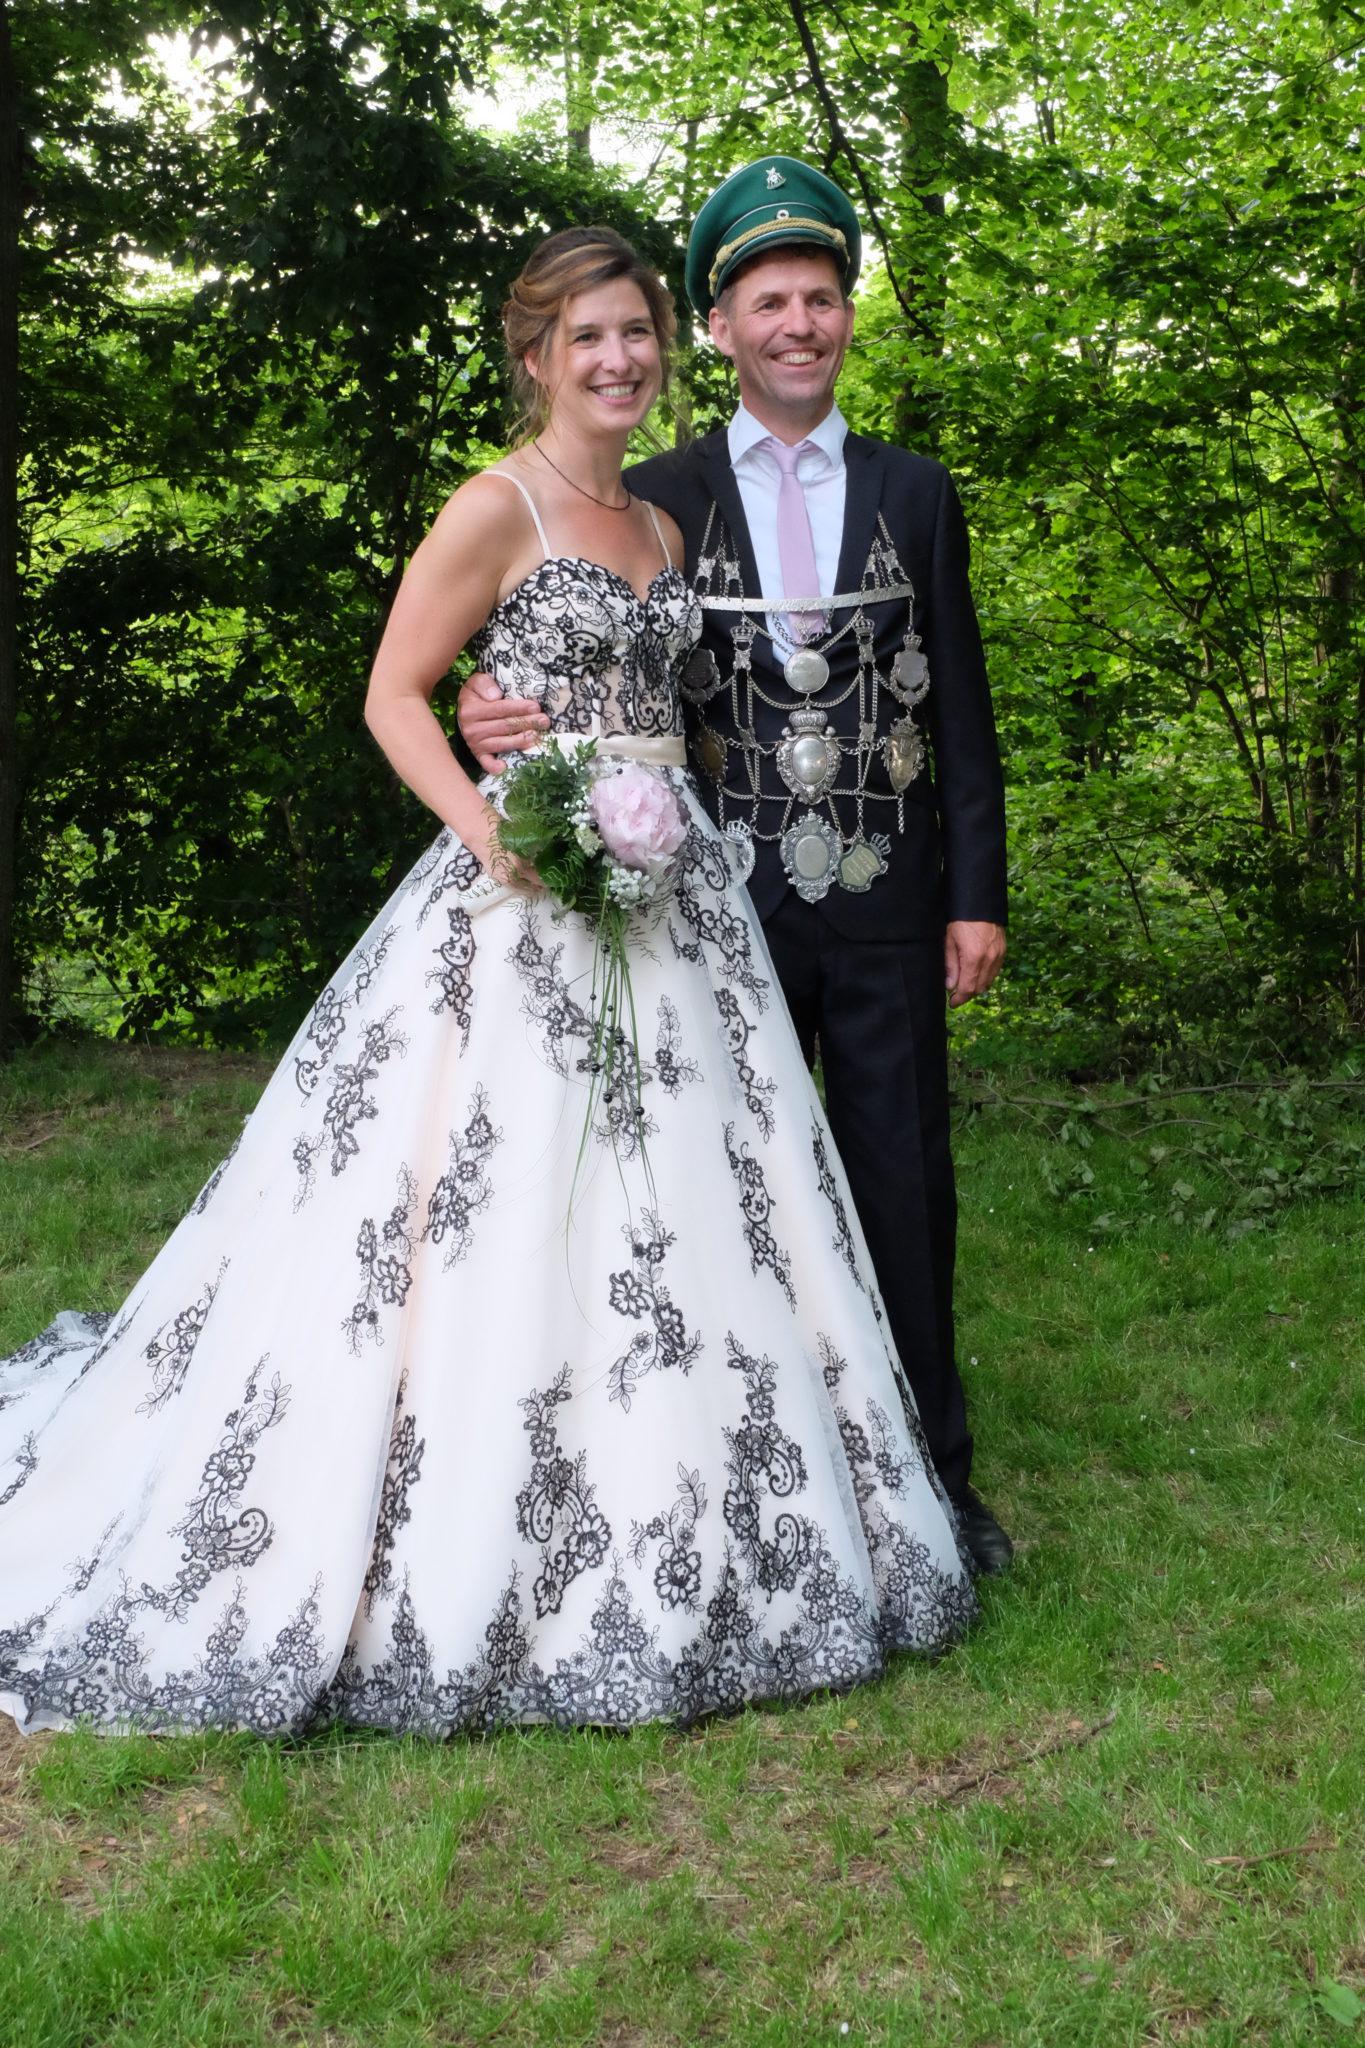 Königspaar 2019/20 Lothar Lemberg und Yvonne Luckey (Schützenverein Padberg 1828 e.V.)